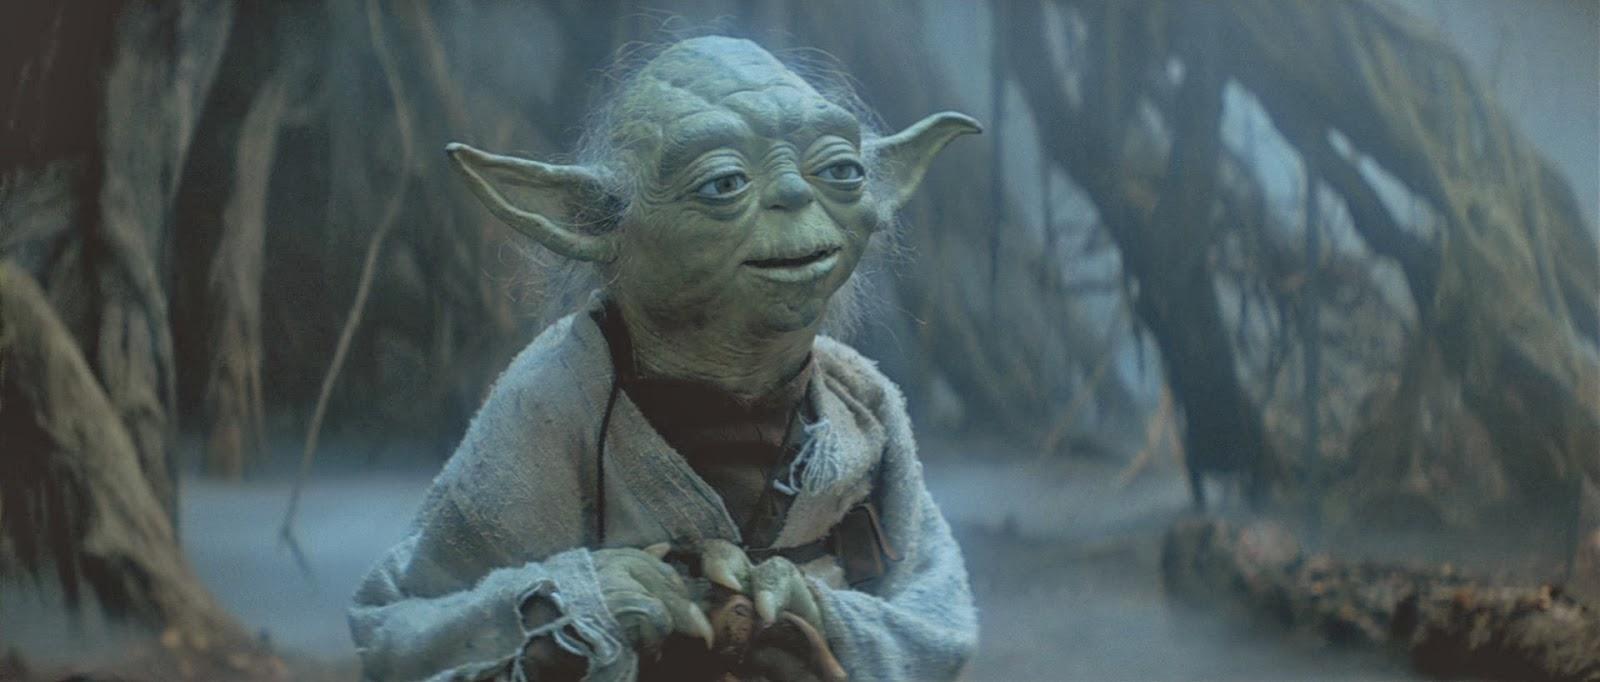 5 On 5 Roundtable Yoda The Star Wars Underworld